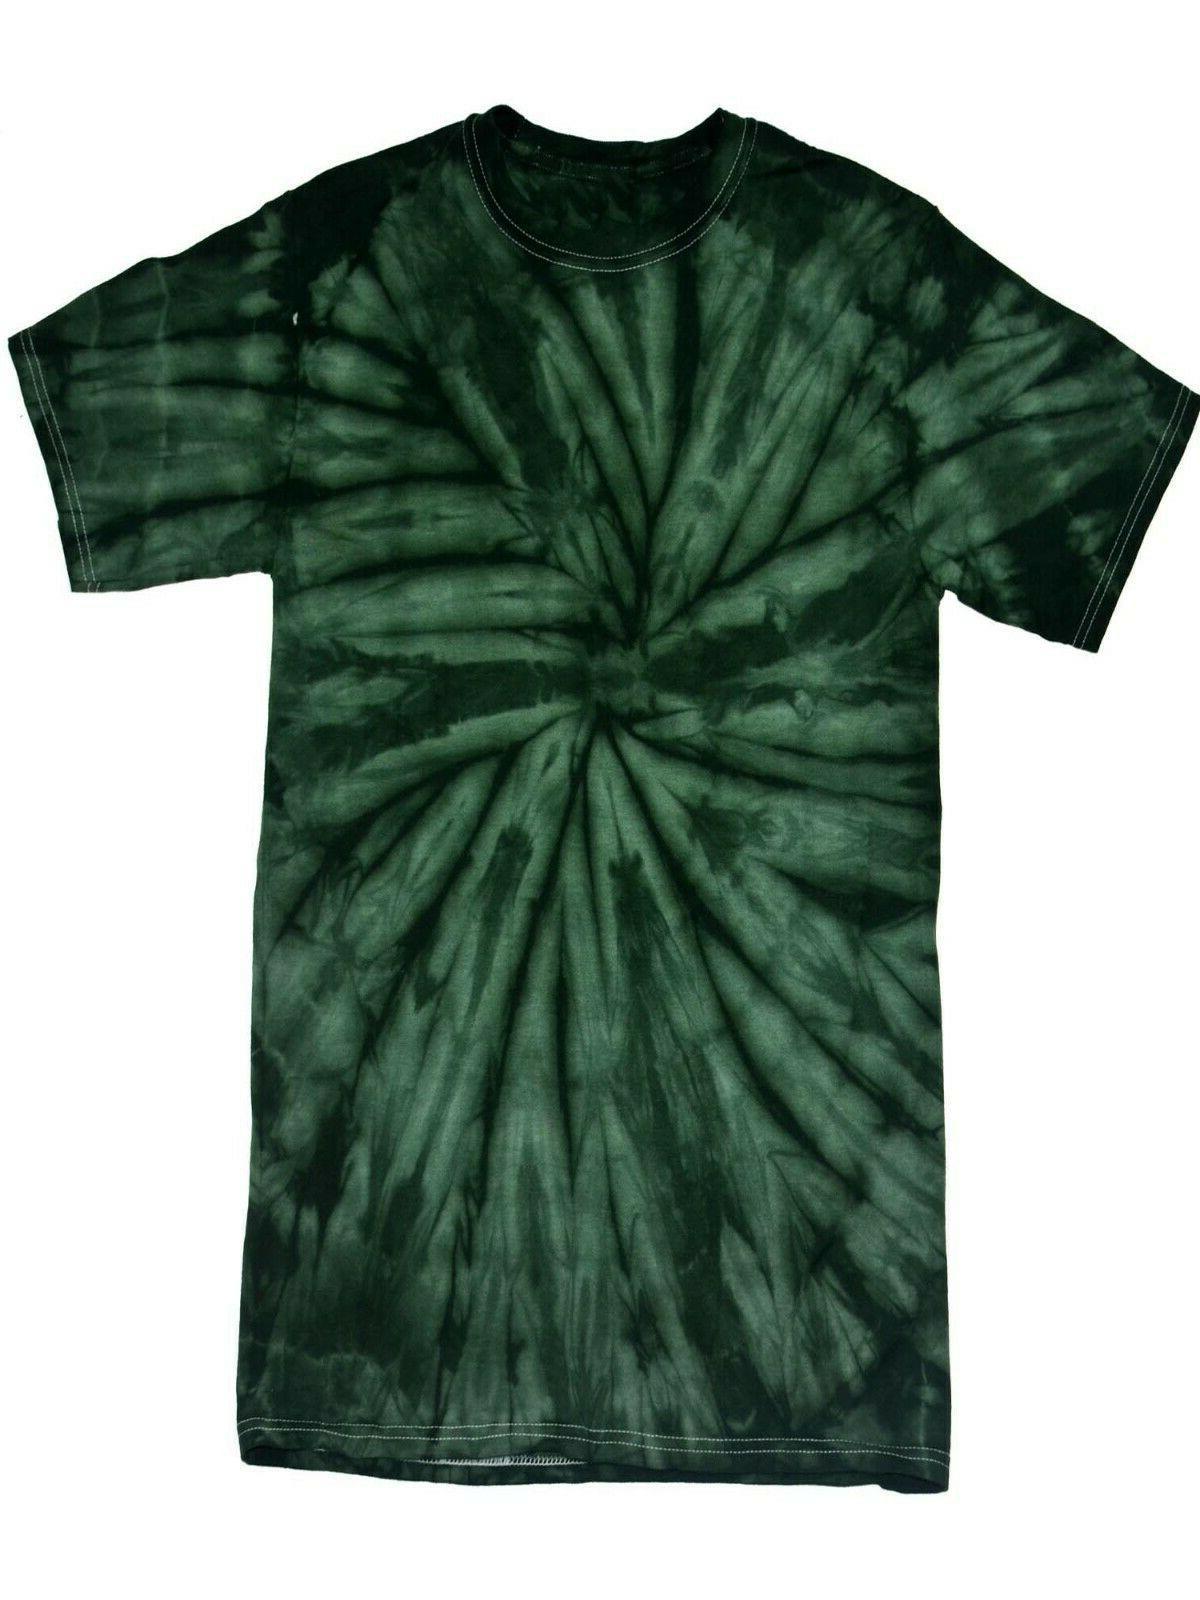 Vibrant Tie T-Shirts SM XXXXXL 100%